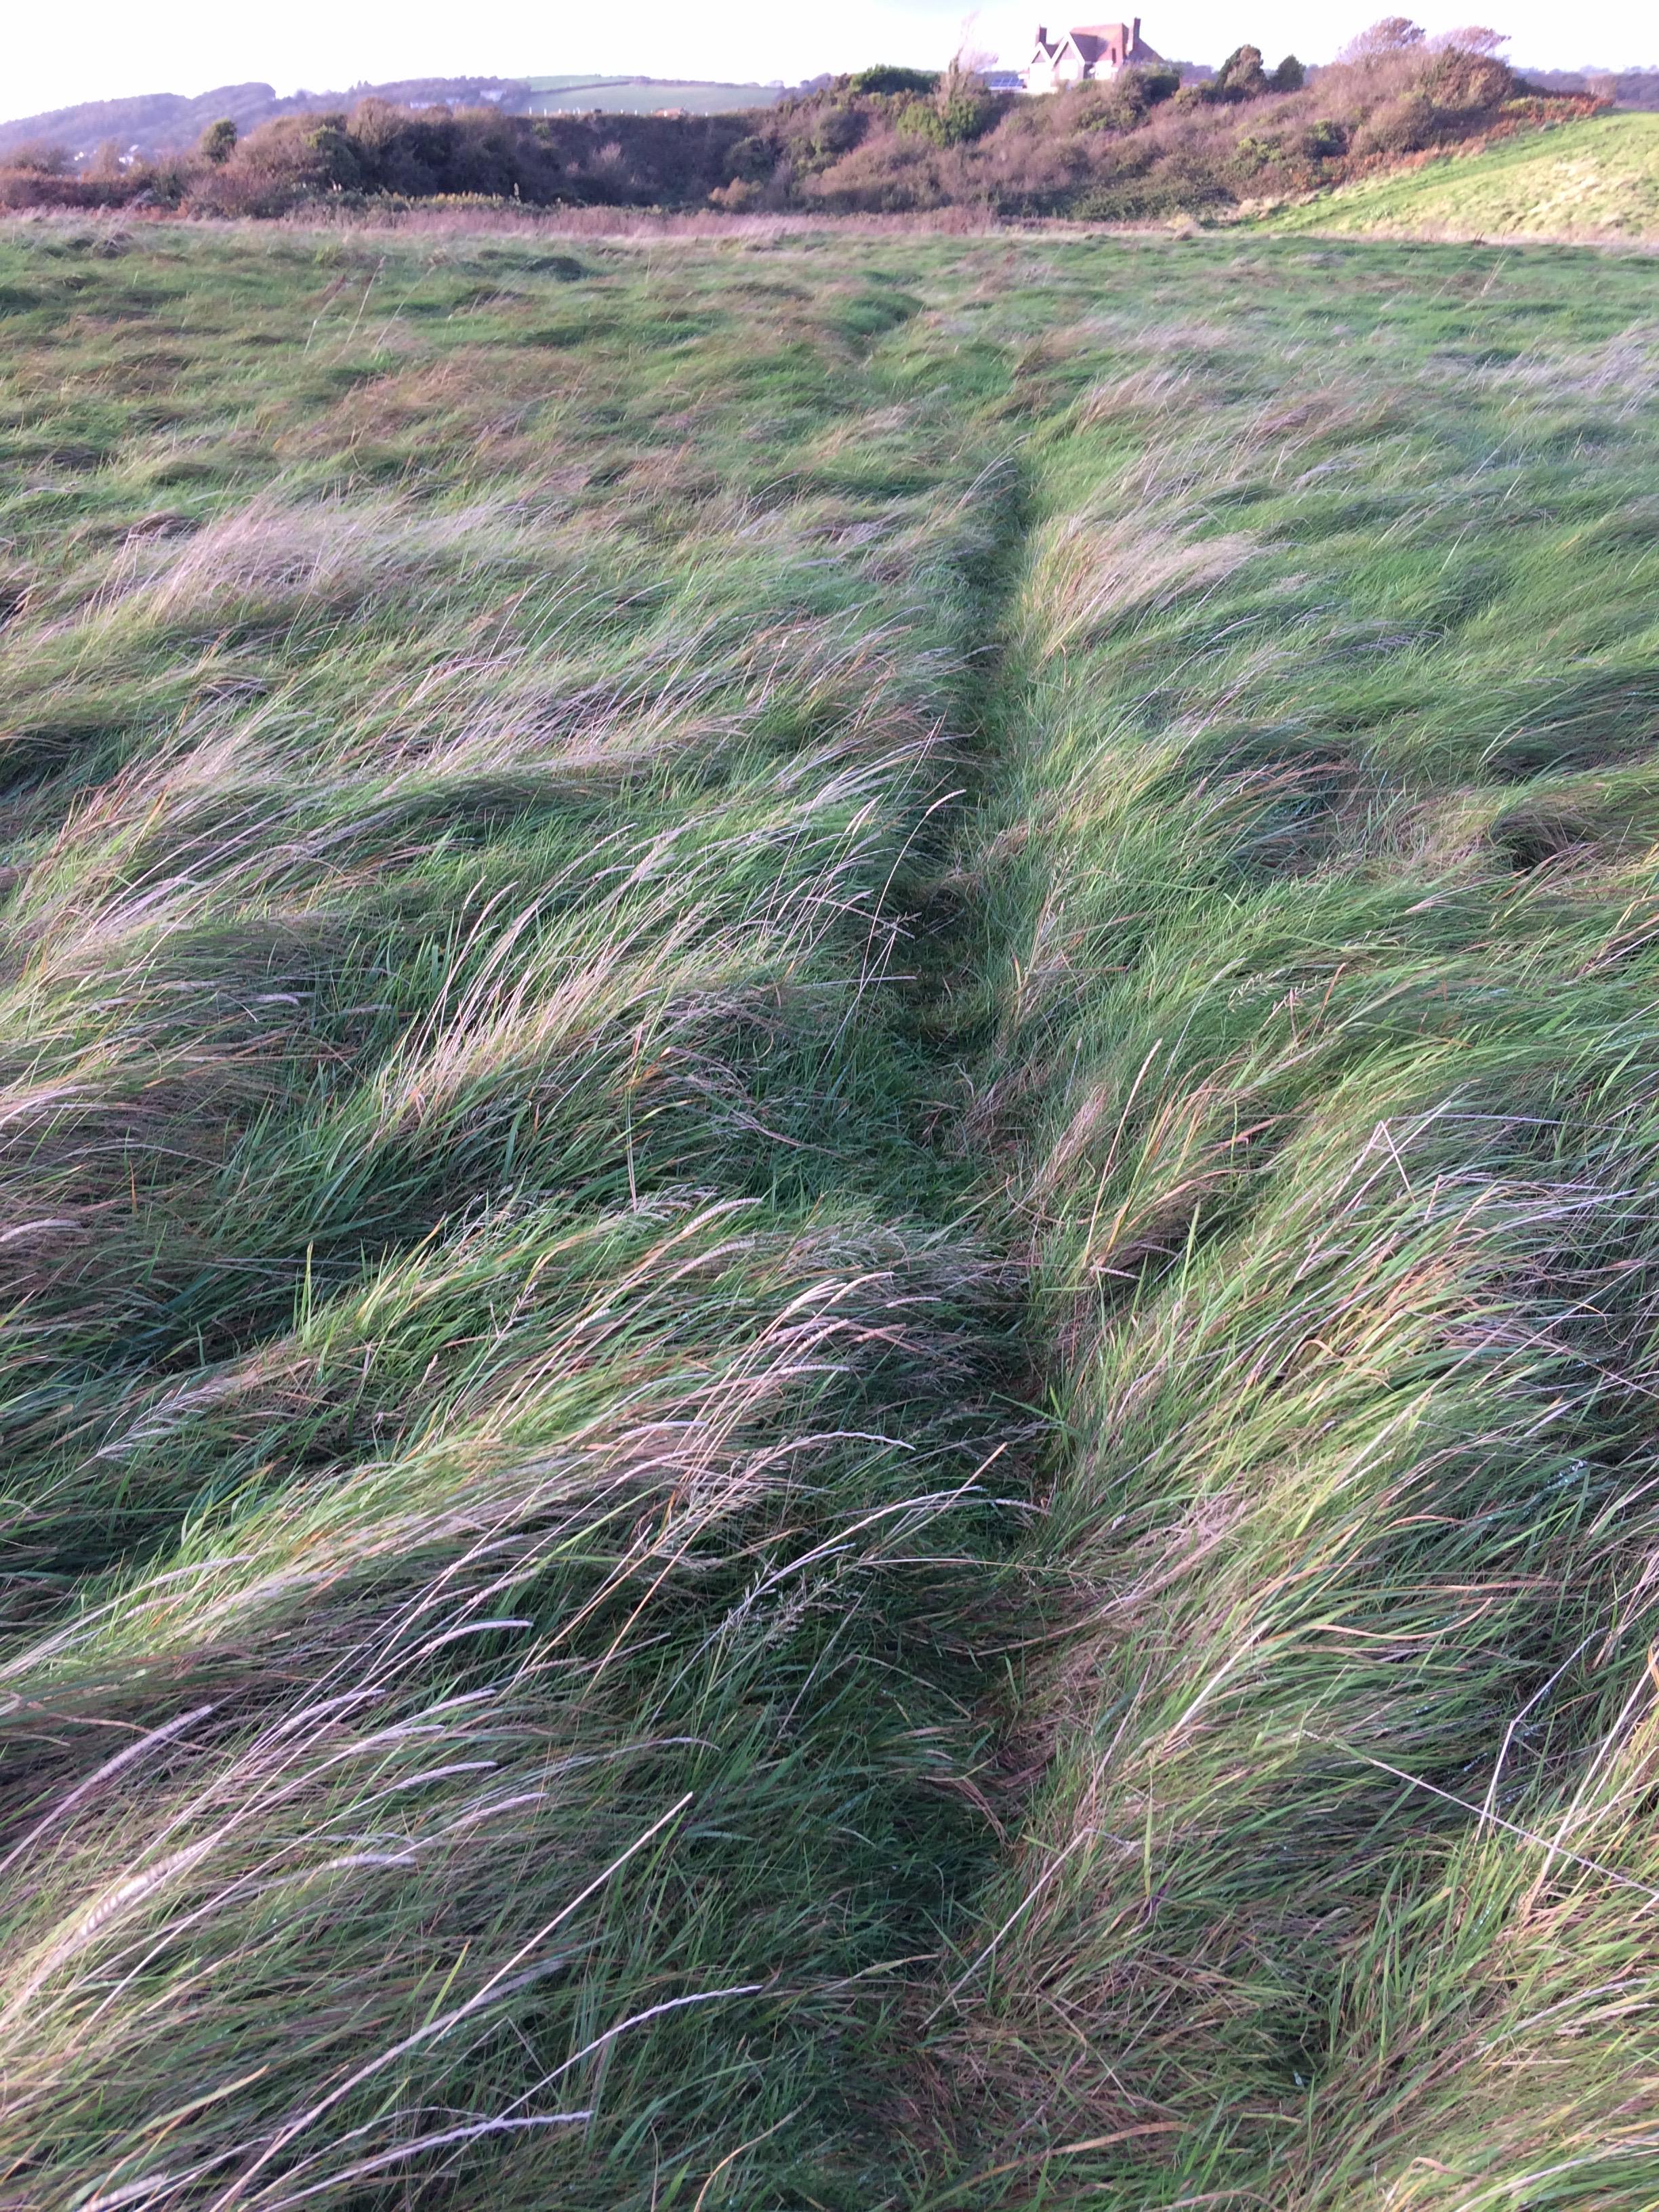 Roz Moreton - Grasses Project - Paths - Burry Port 2018